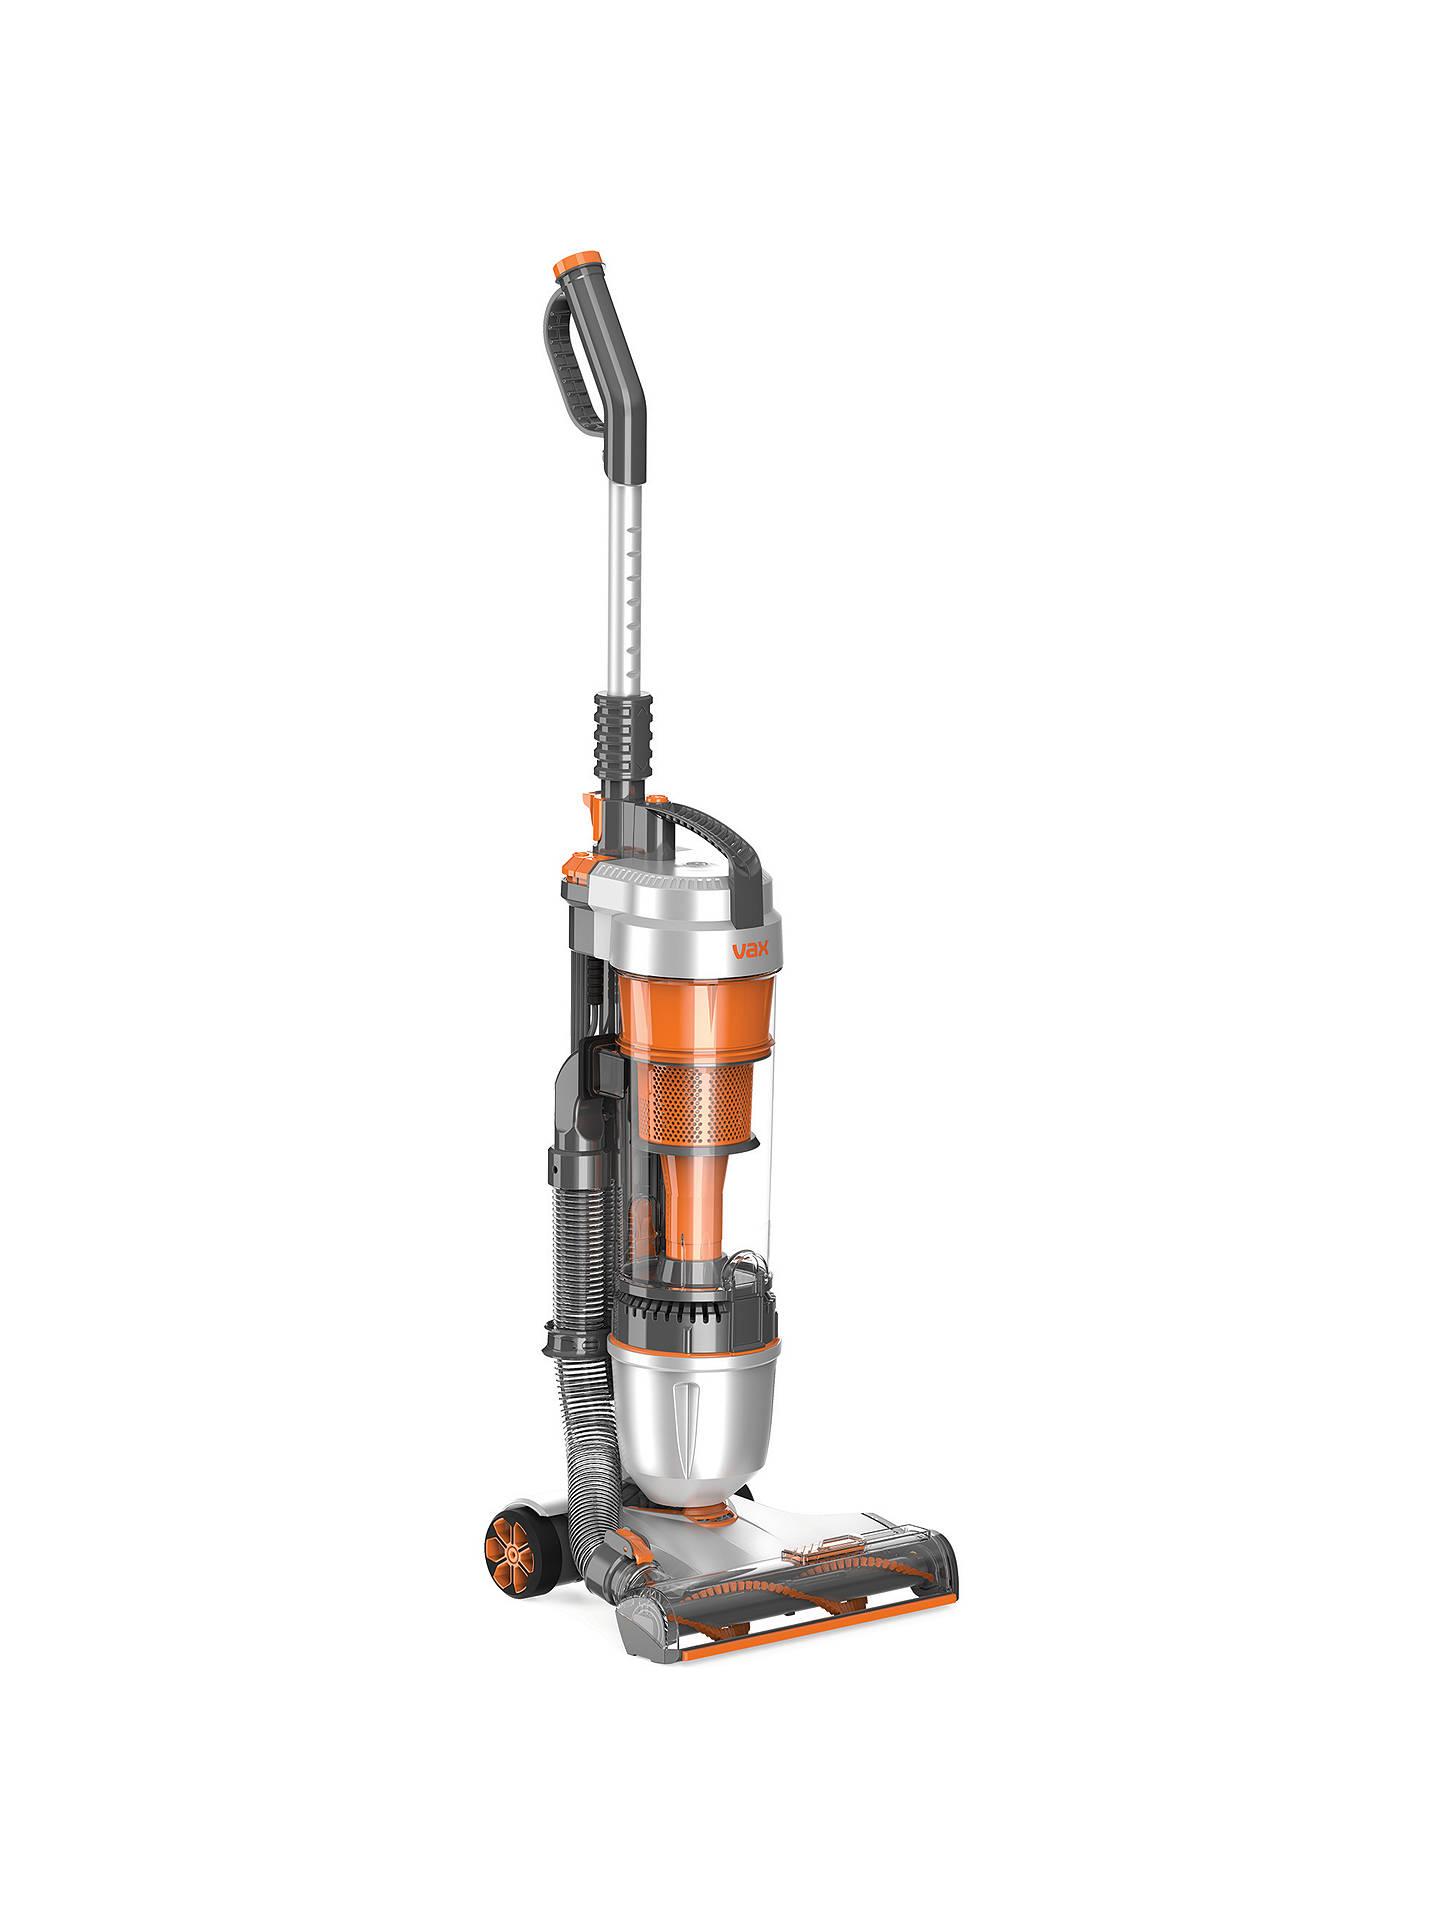 Vax U85 As Be Air Stretch Vacuum Cleaner Orange At John